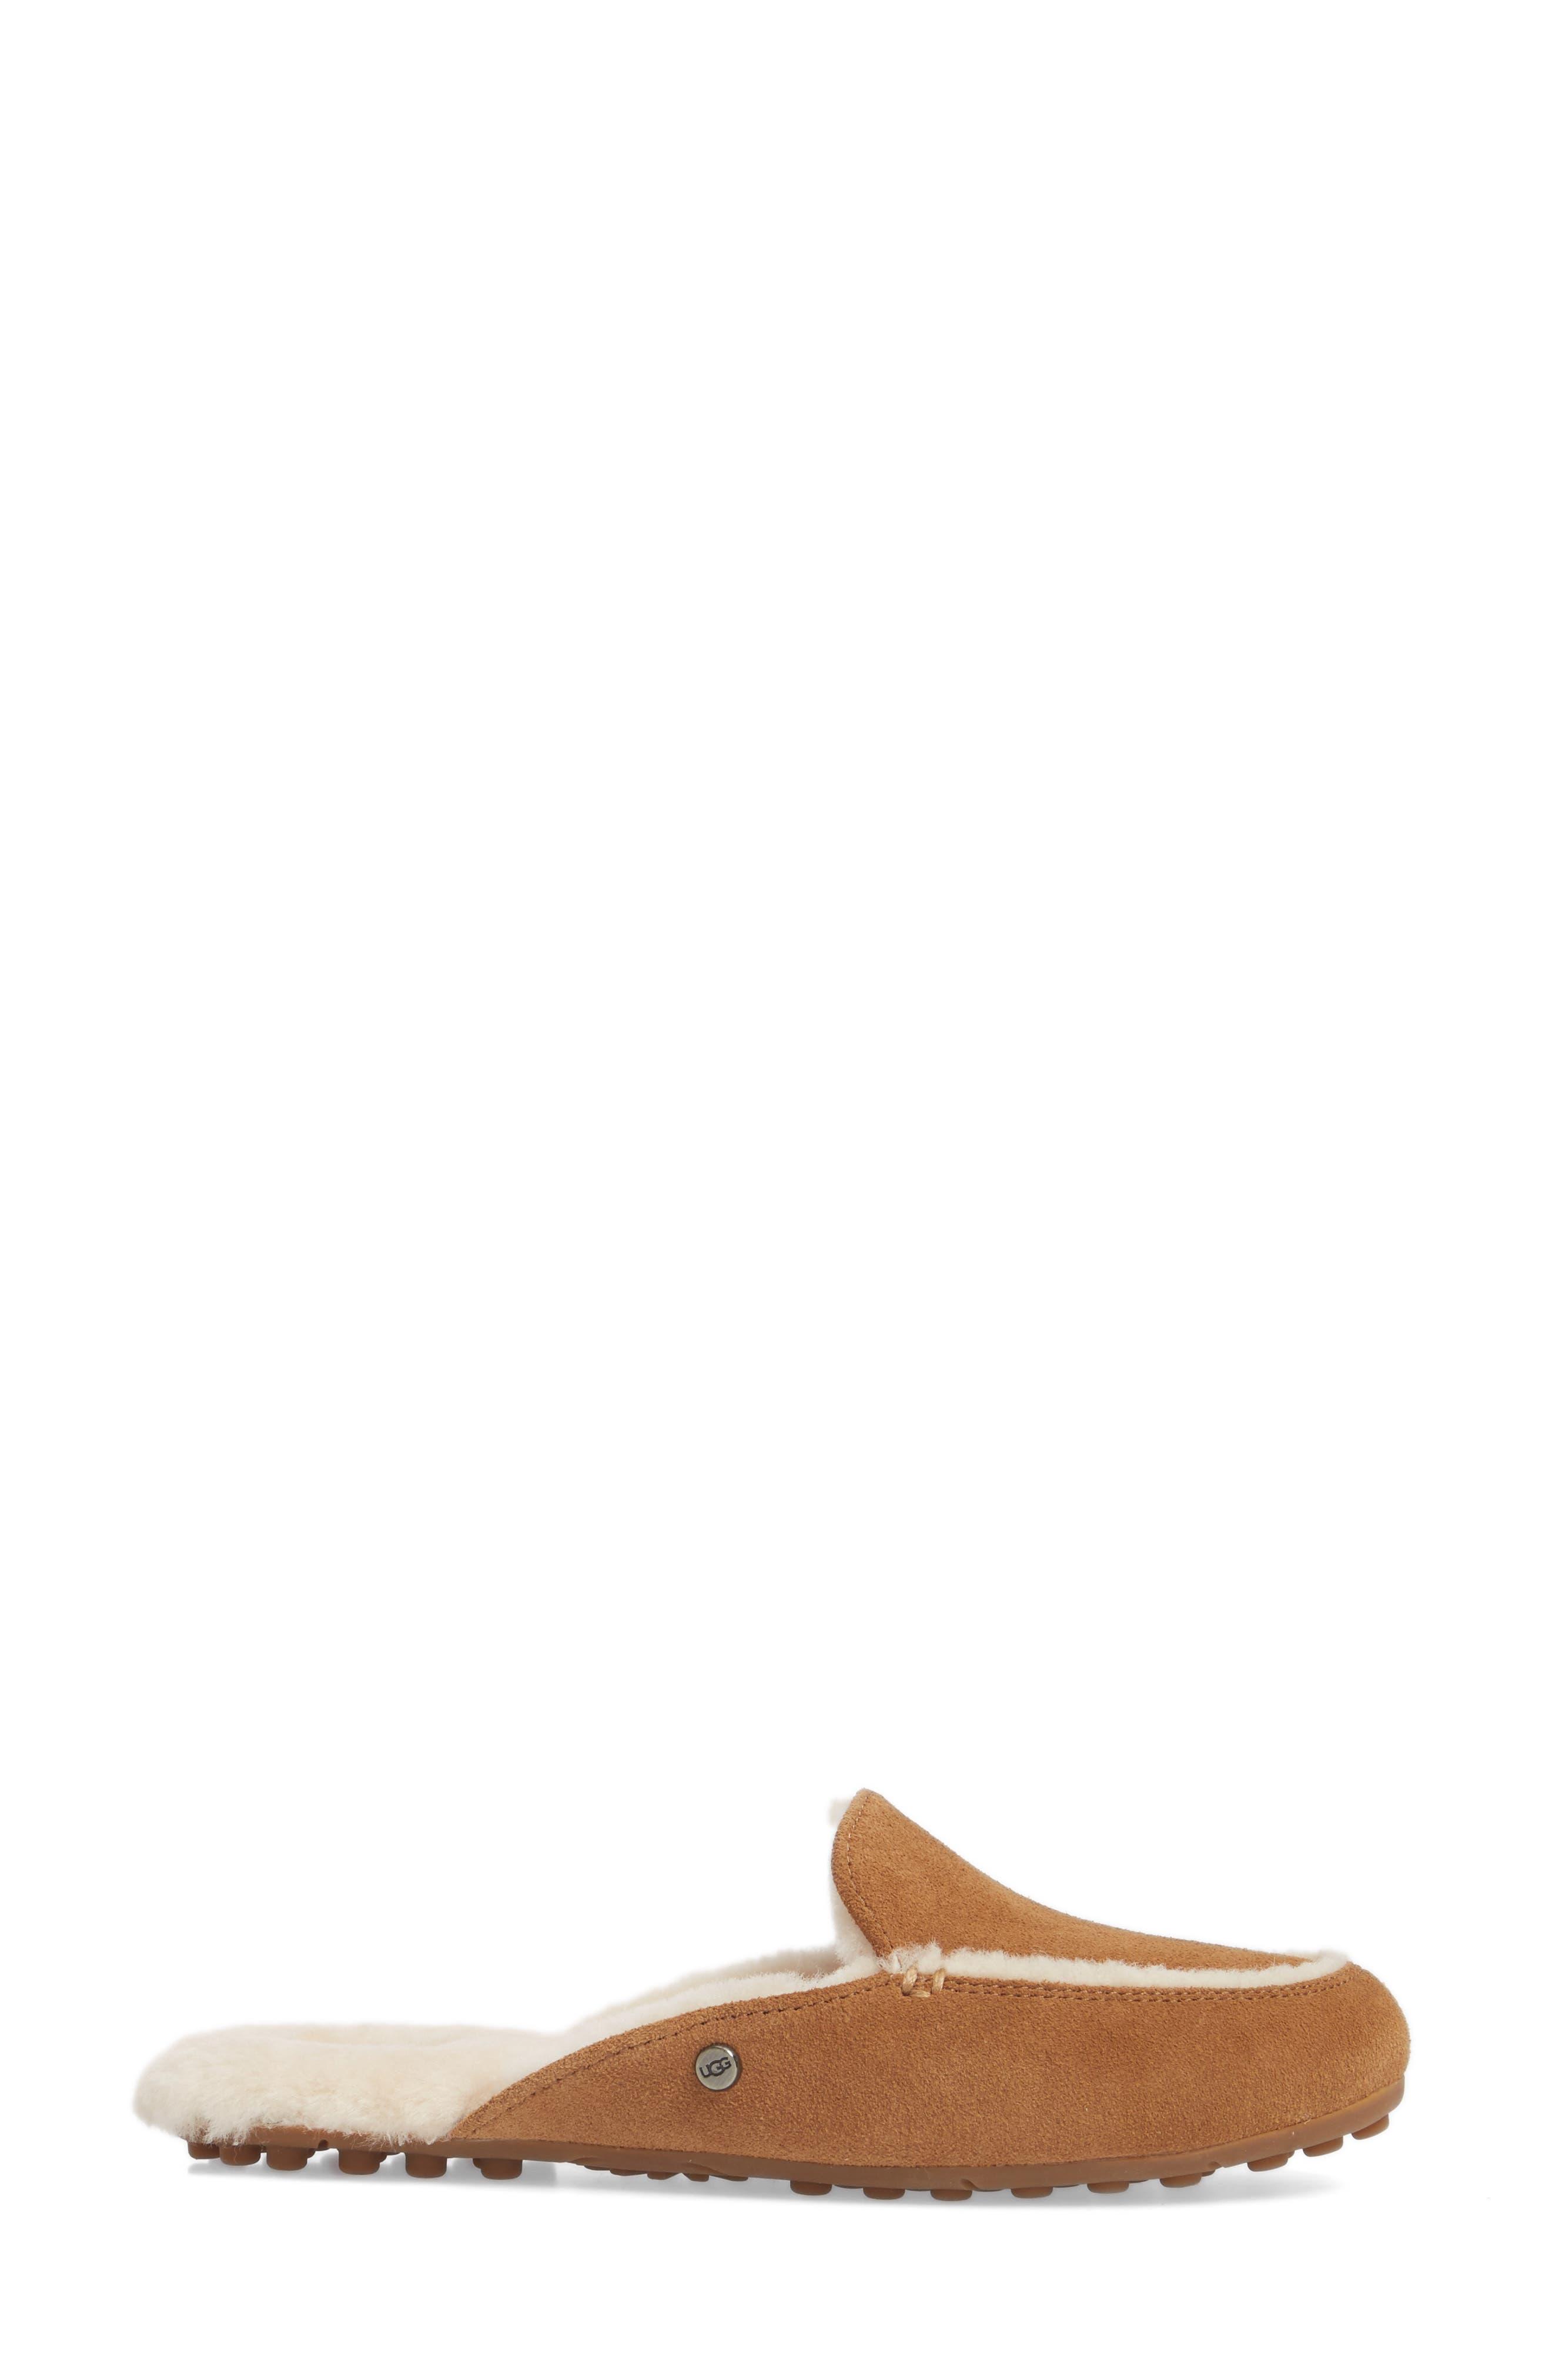 Lane Genuine Shearling Slipper,                             Alternate thumbnail 3, color,                             Chestnut Suede